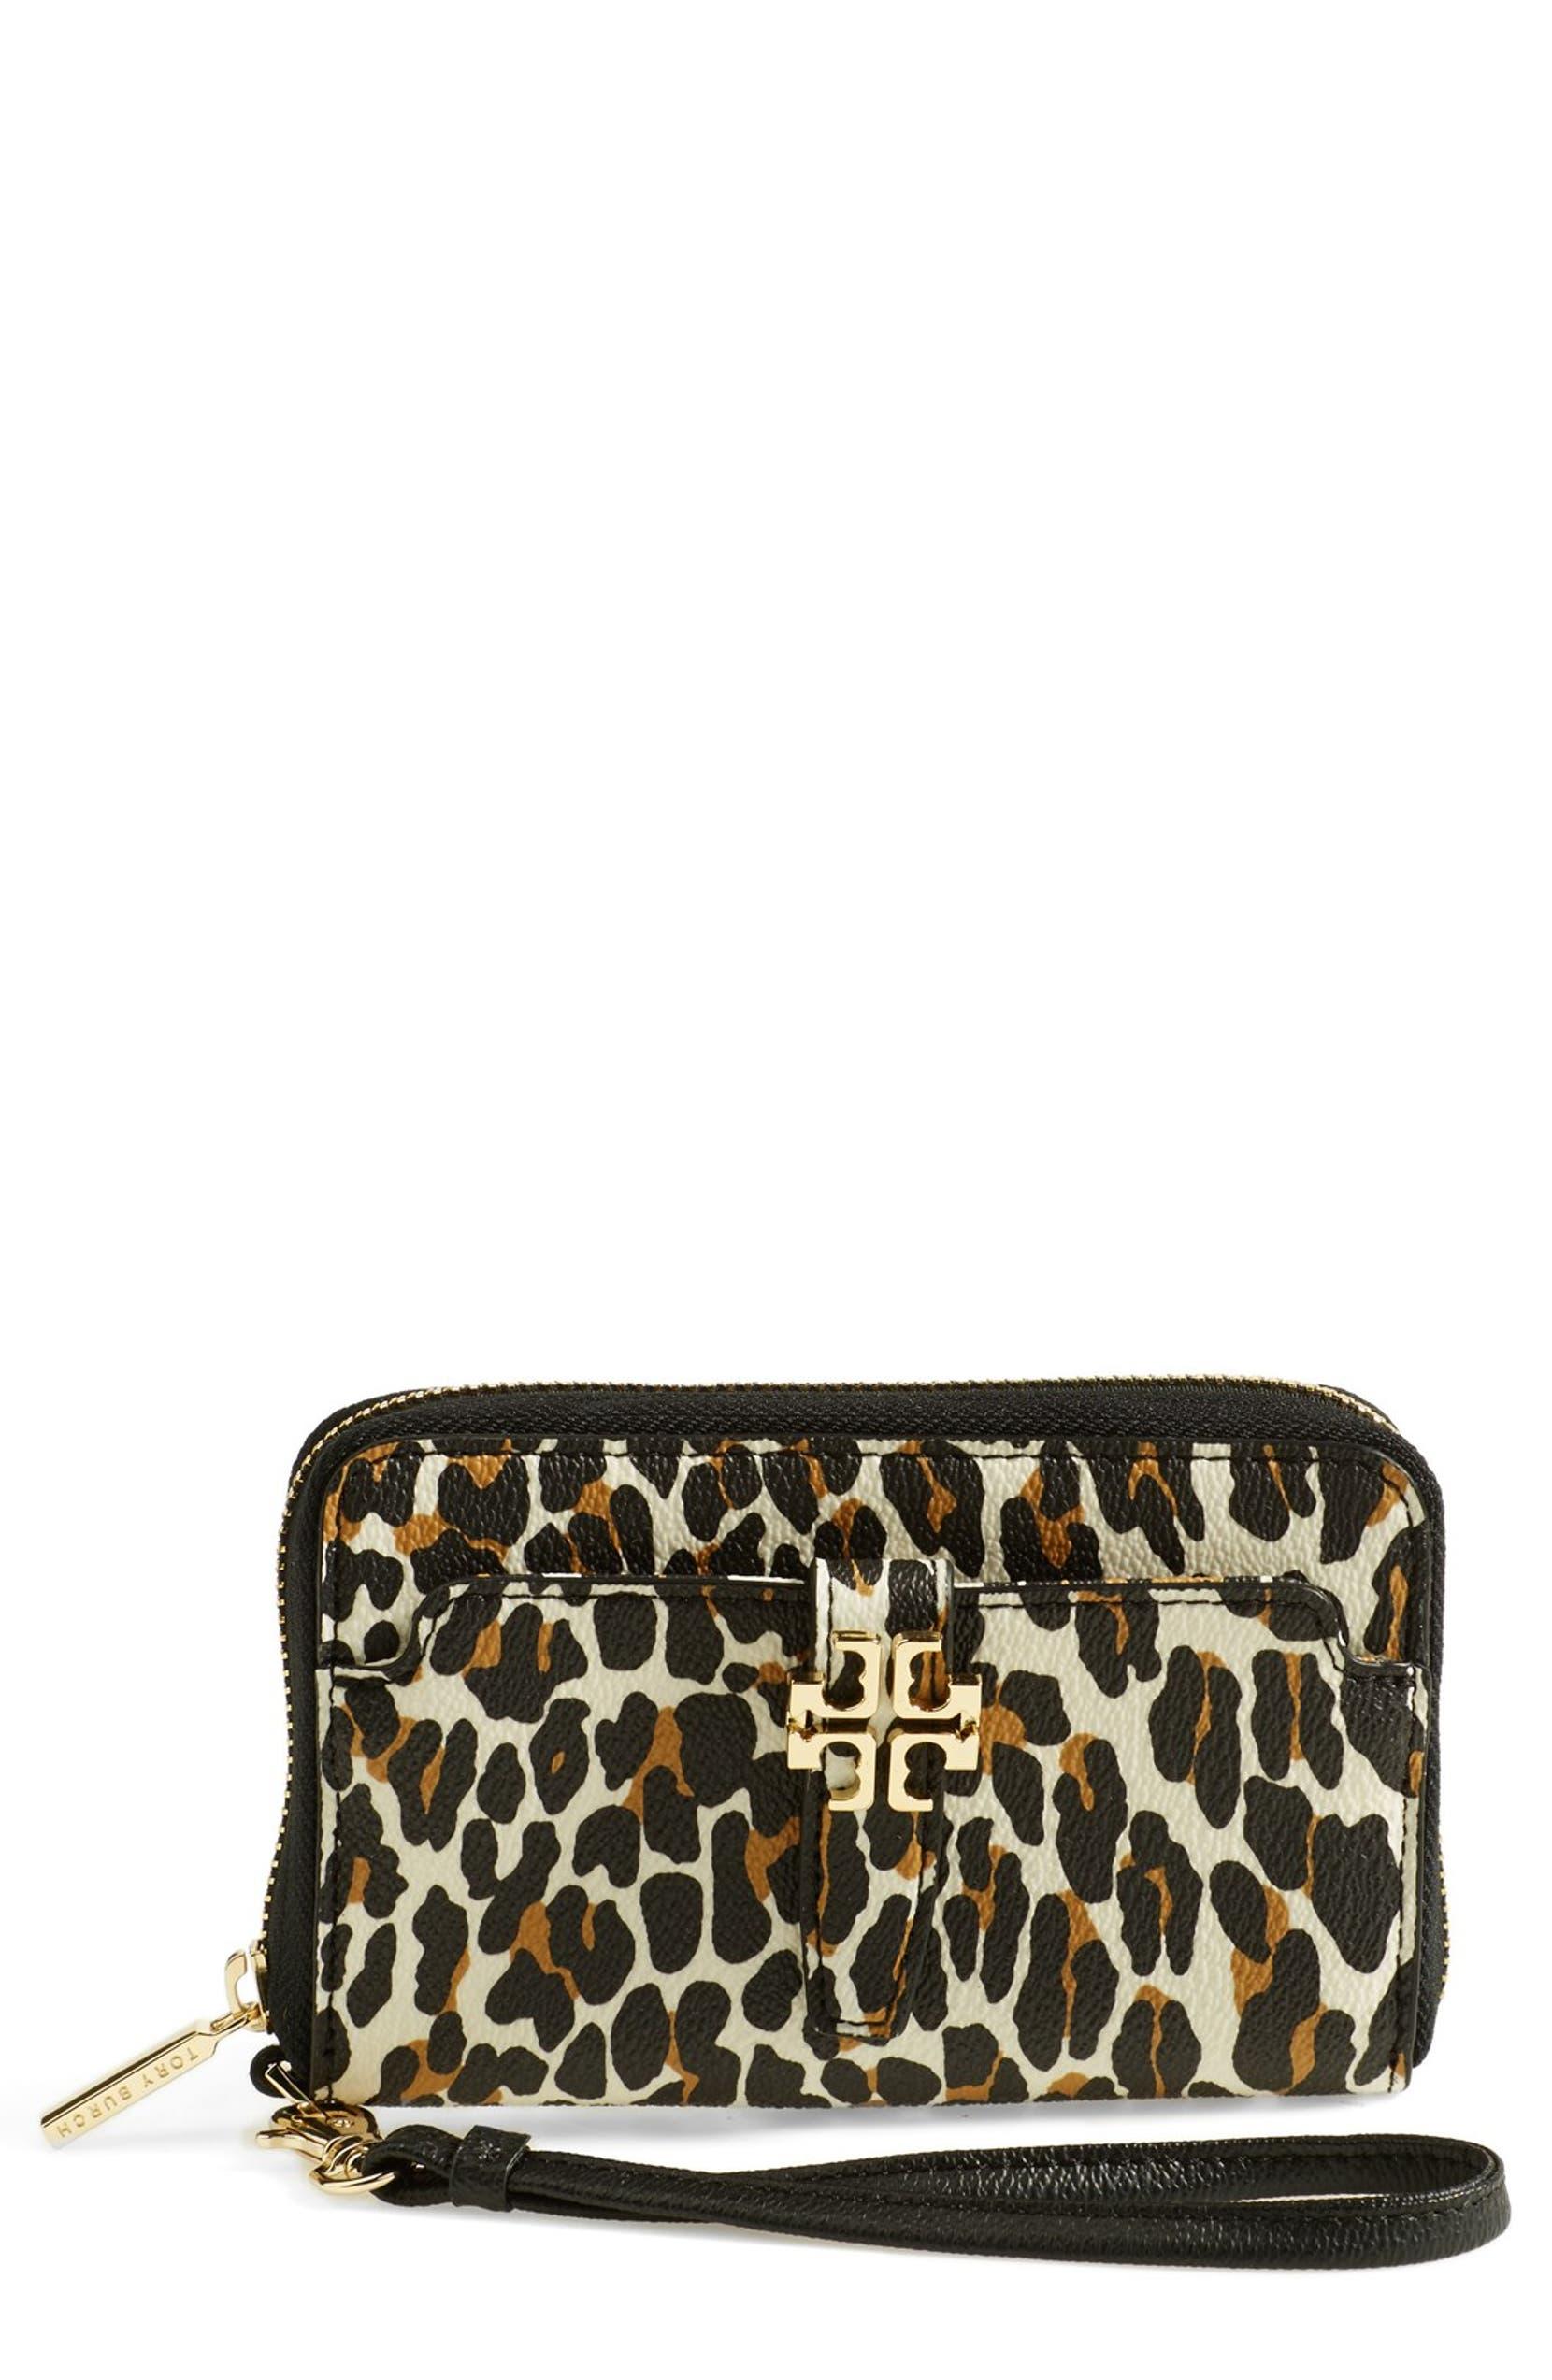 36c6b278b5f5 Tory Burch  Plaque  Leopard Print Smartphone Wristlet